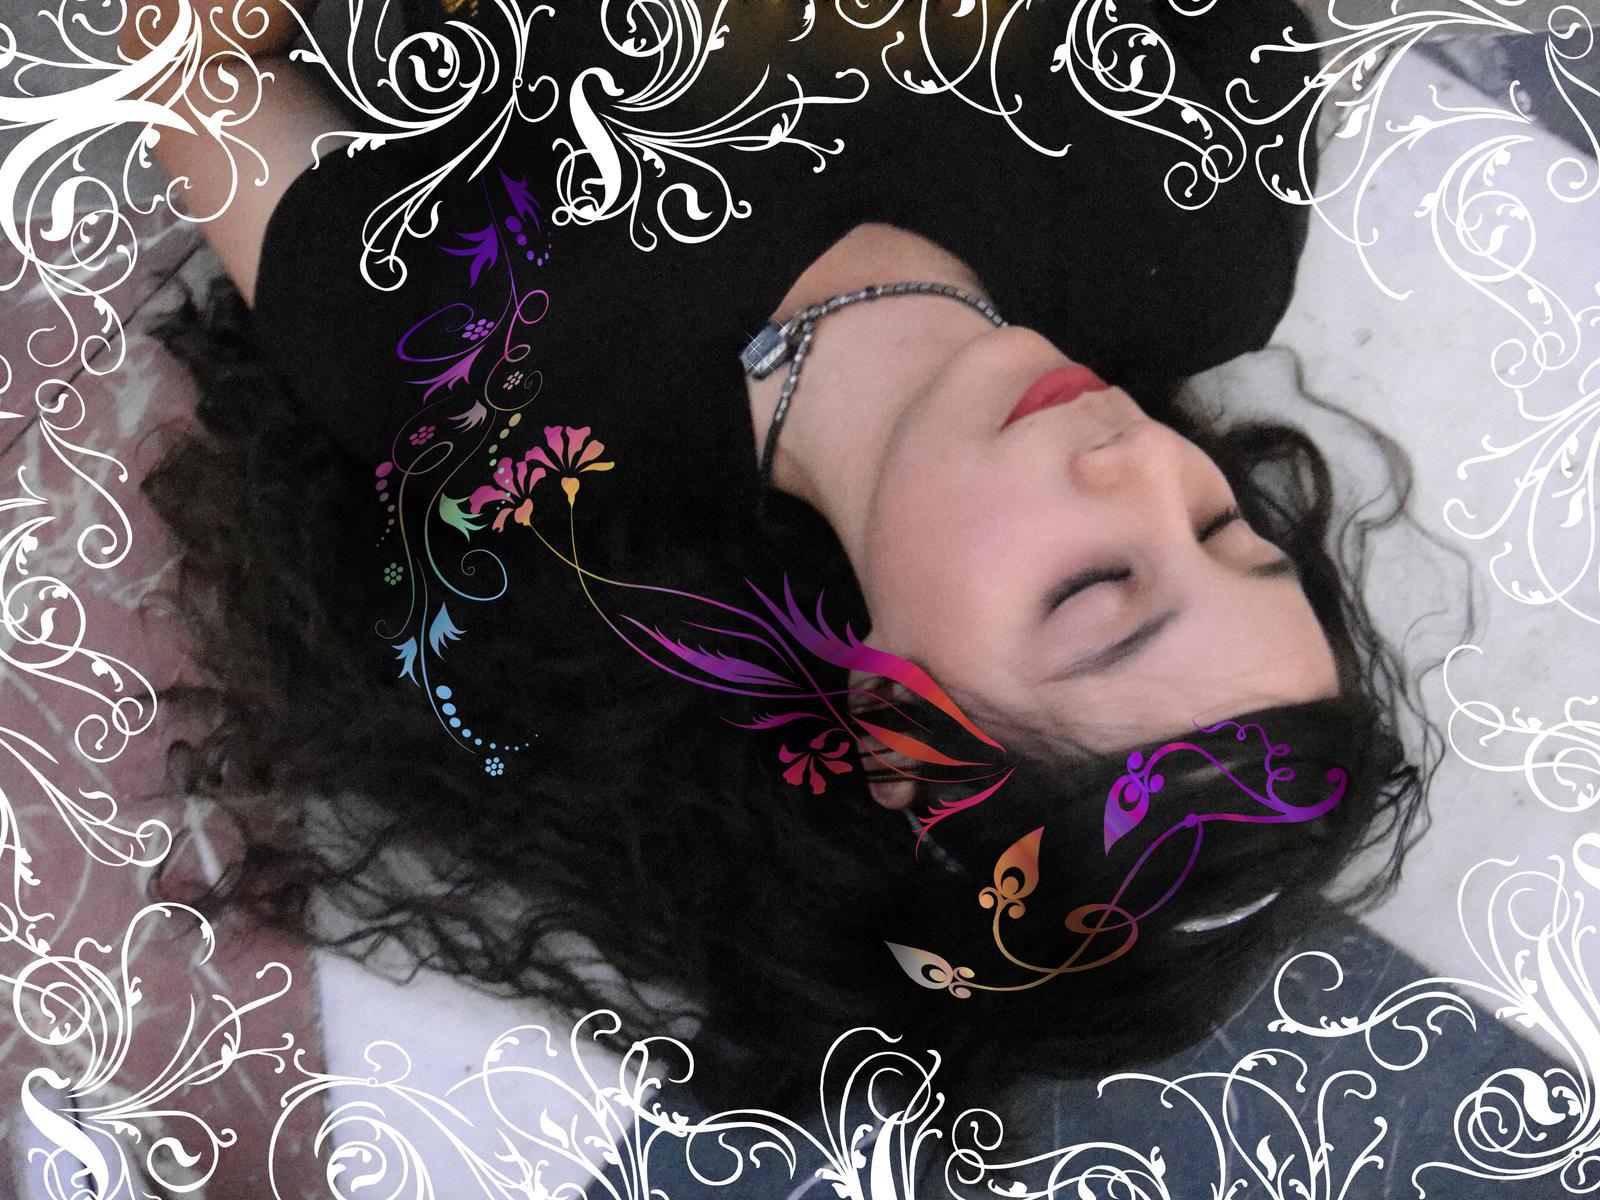 Sleeping beauty has dark hair